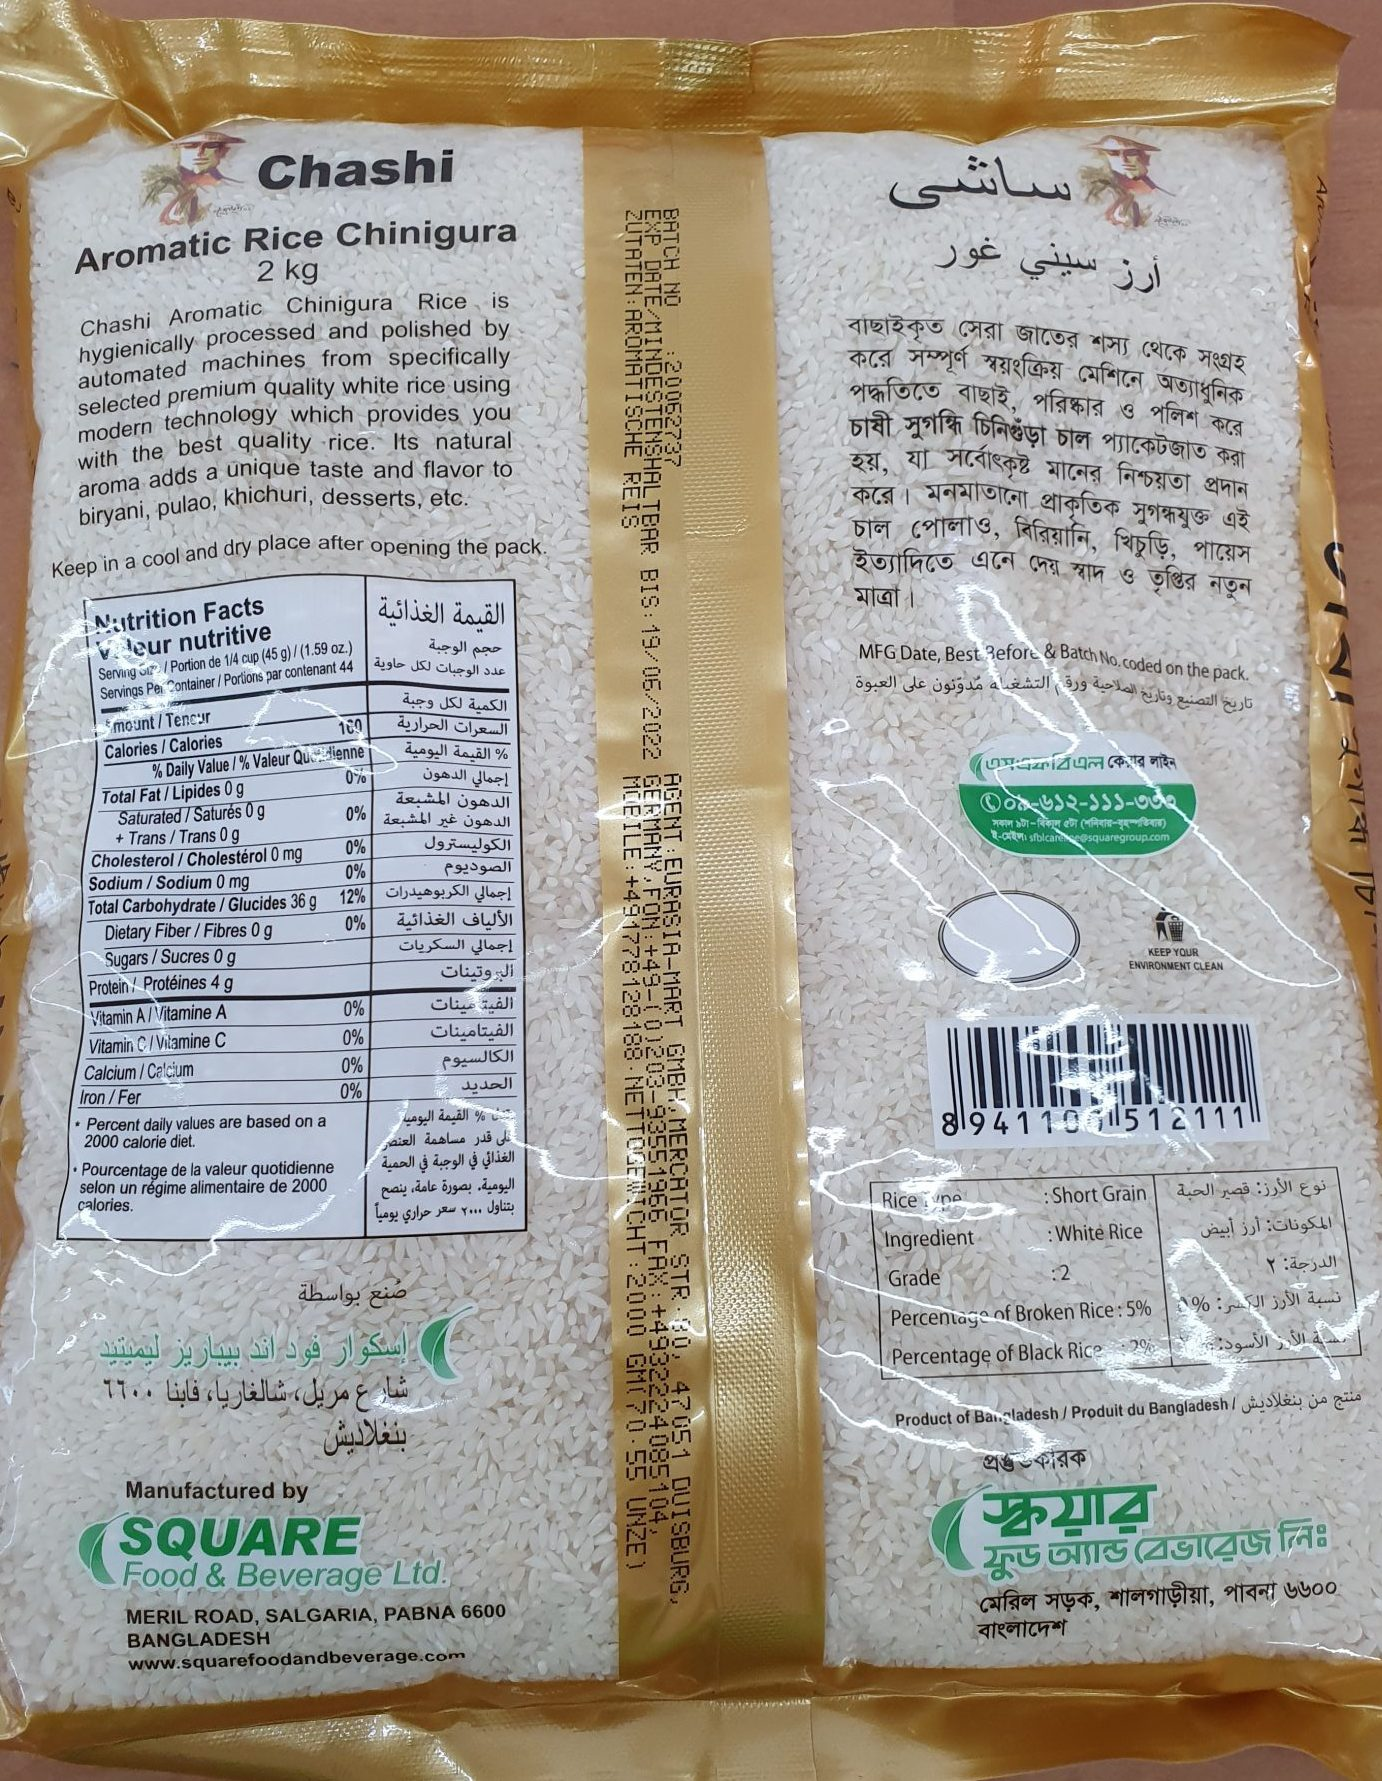 Pran Chashi Chinigura Kalijeera Gobingobhog Aromatic Rice